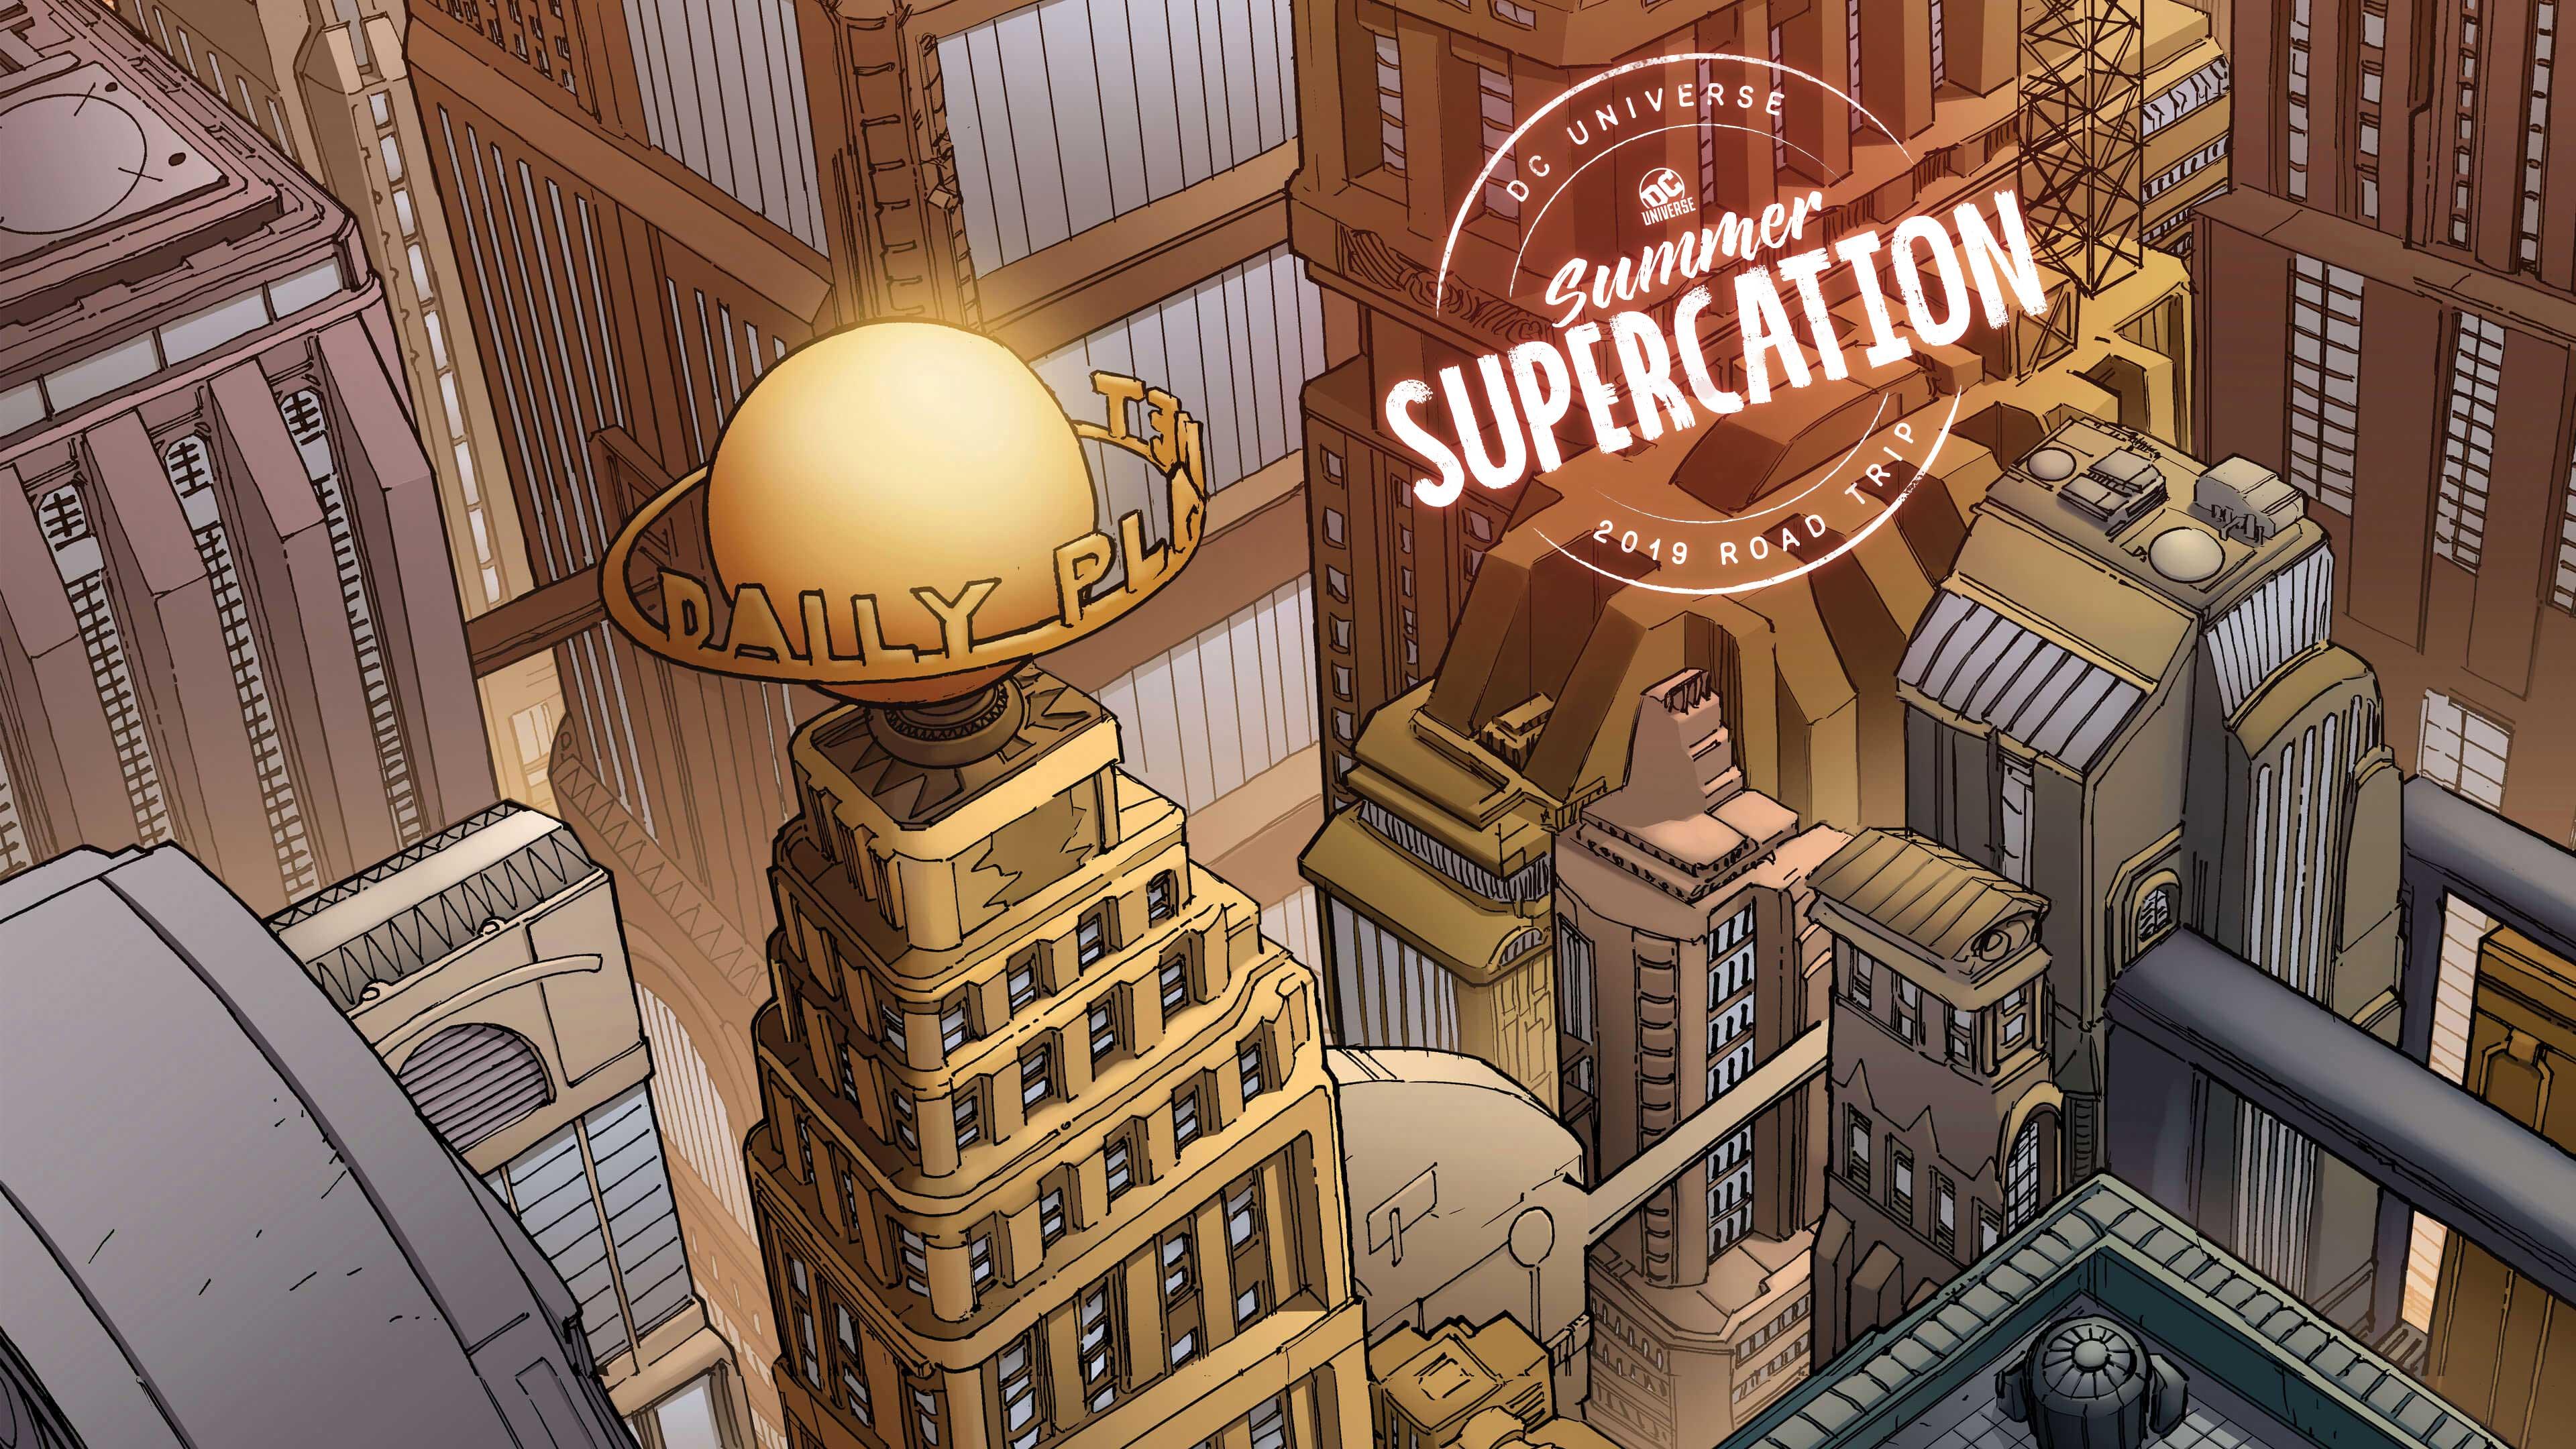 ss-metropolis-news-hero-190606-v1.jpg